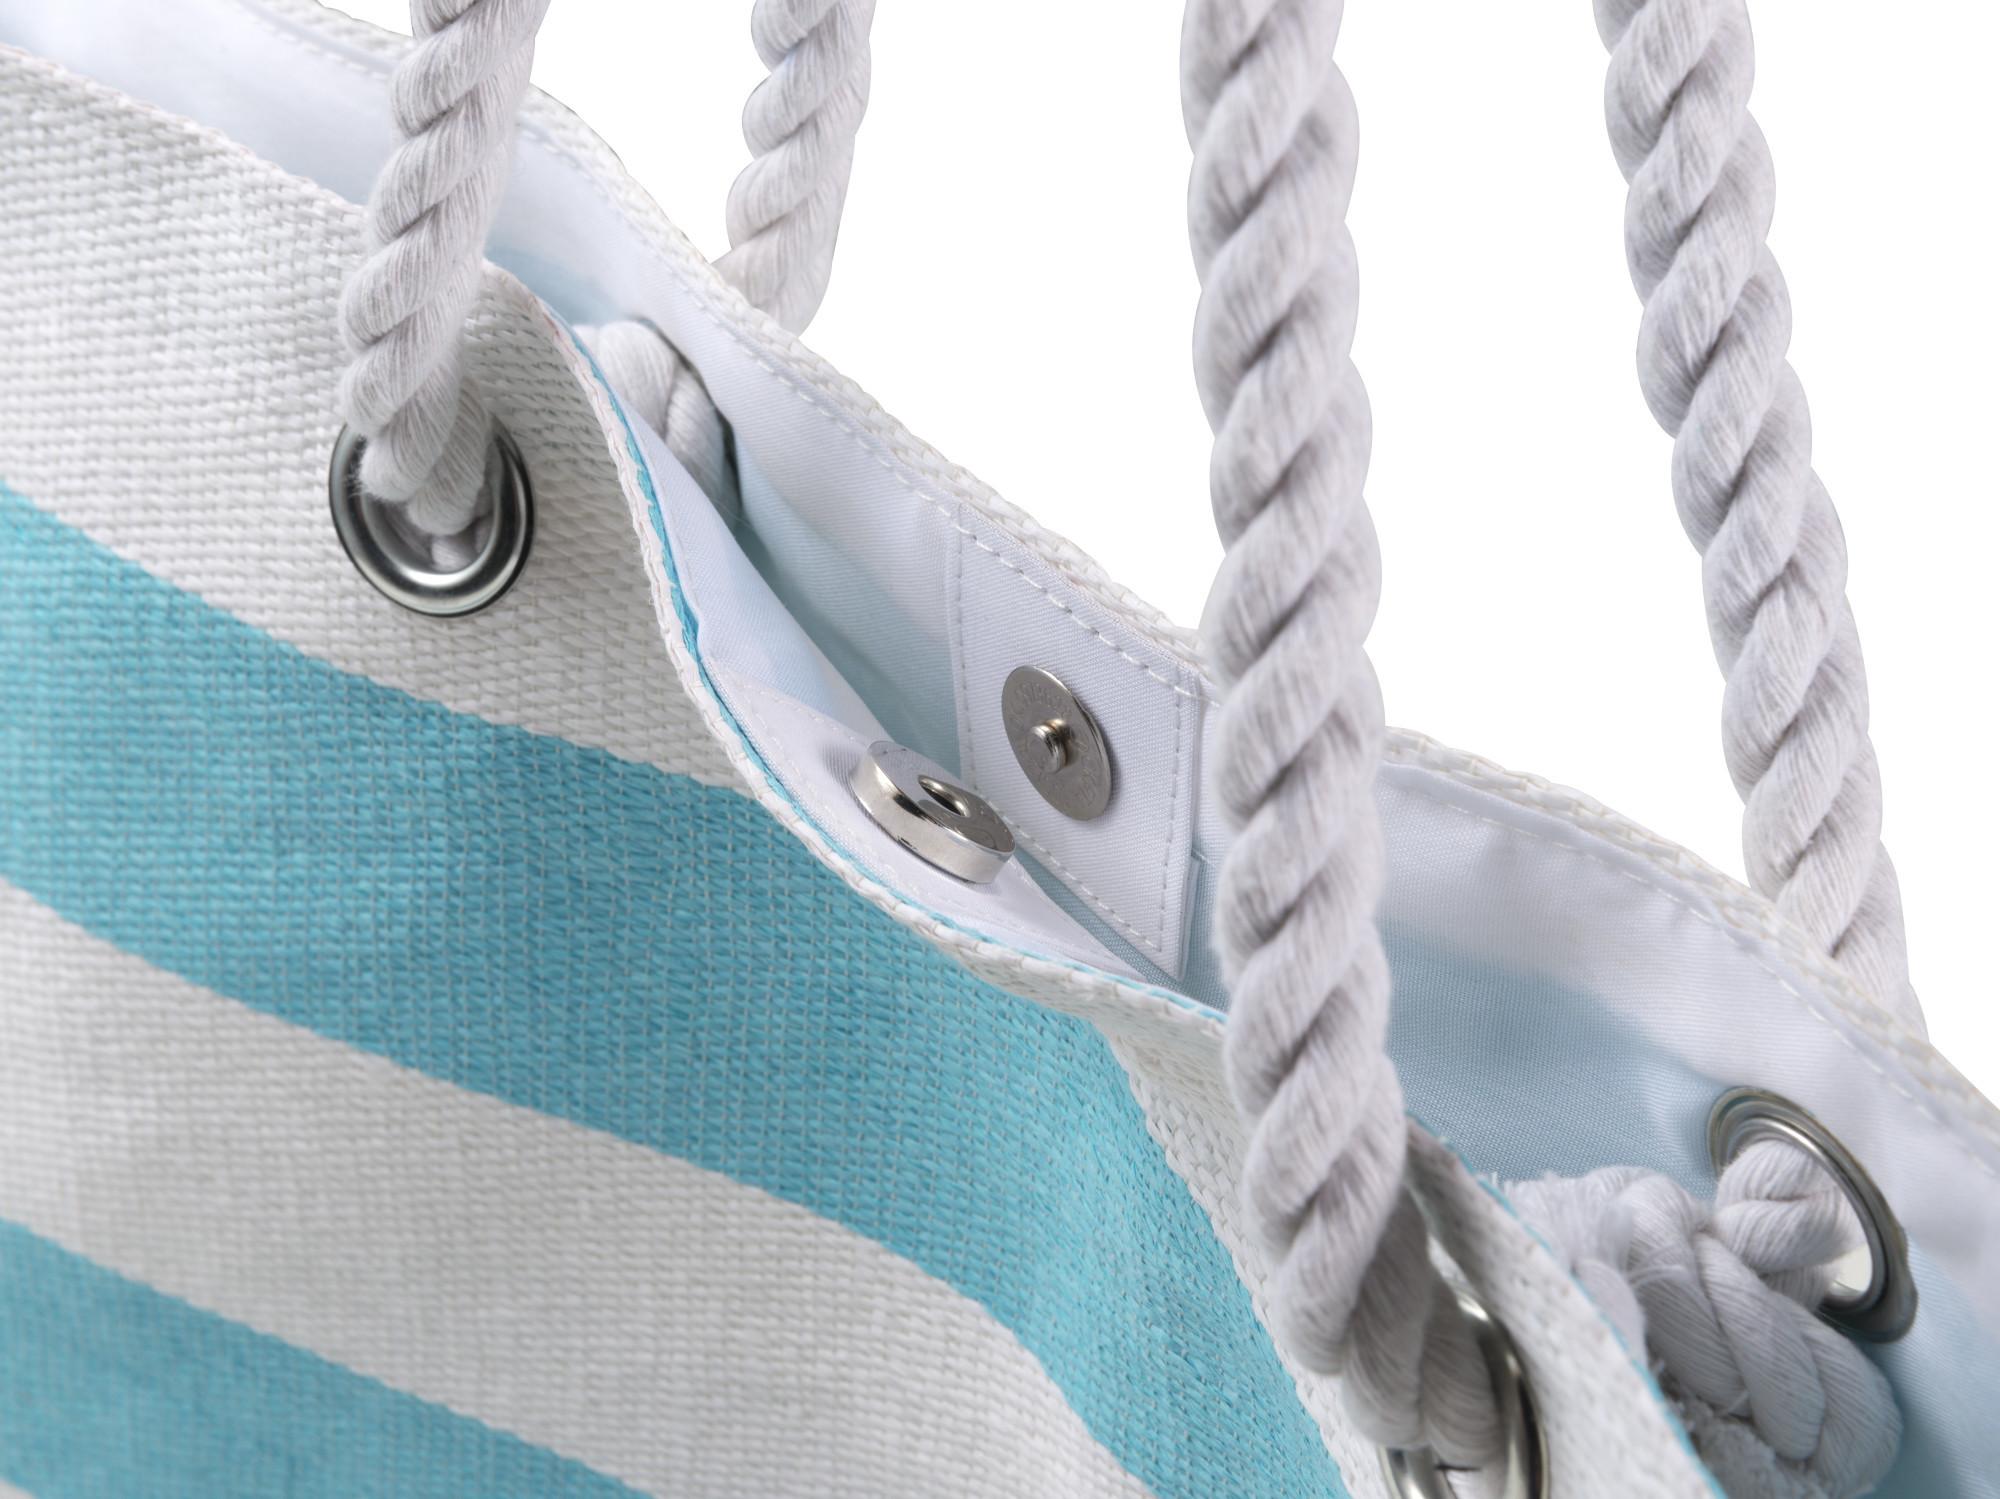 Sac de plage en polyester - 19-1248-13